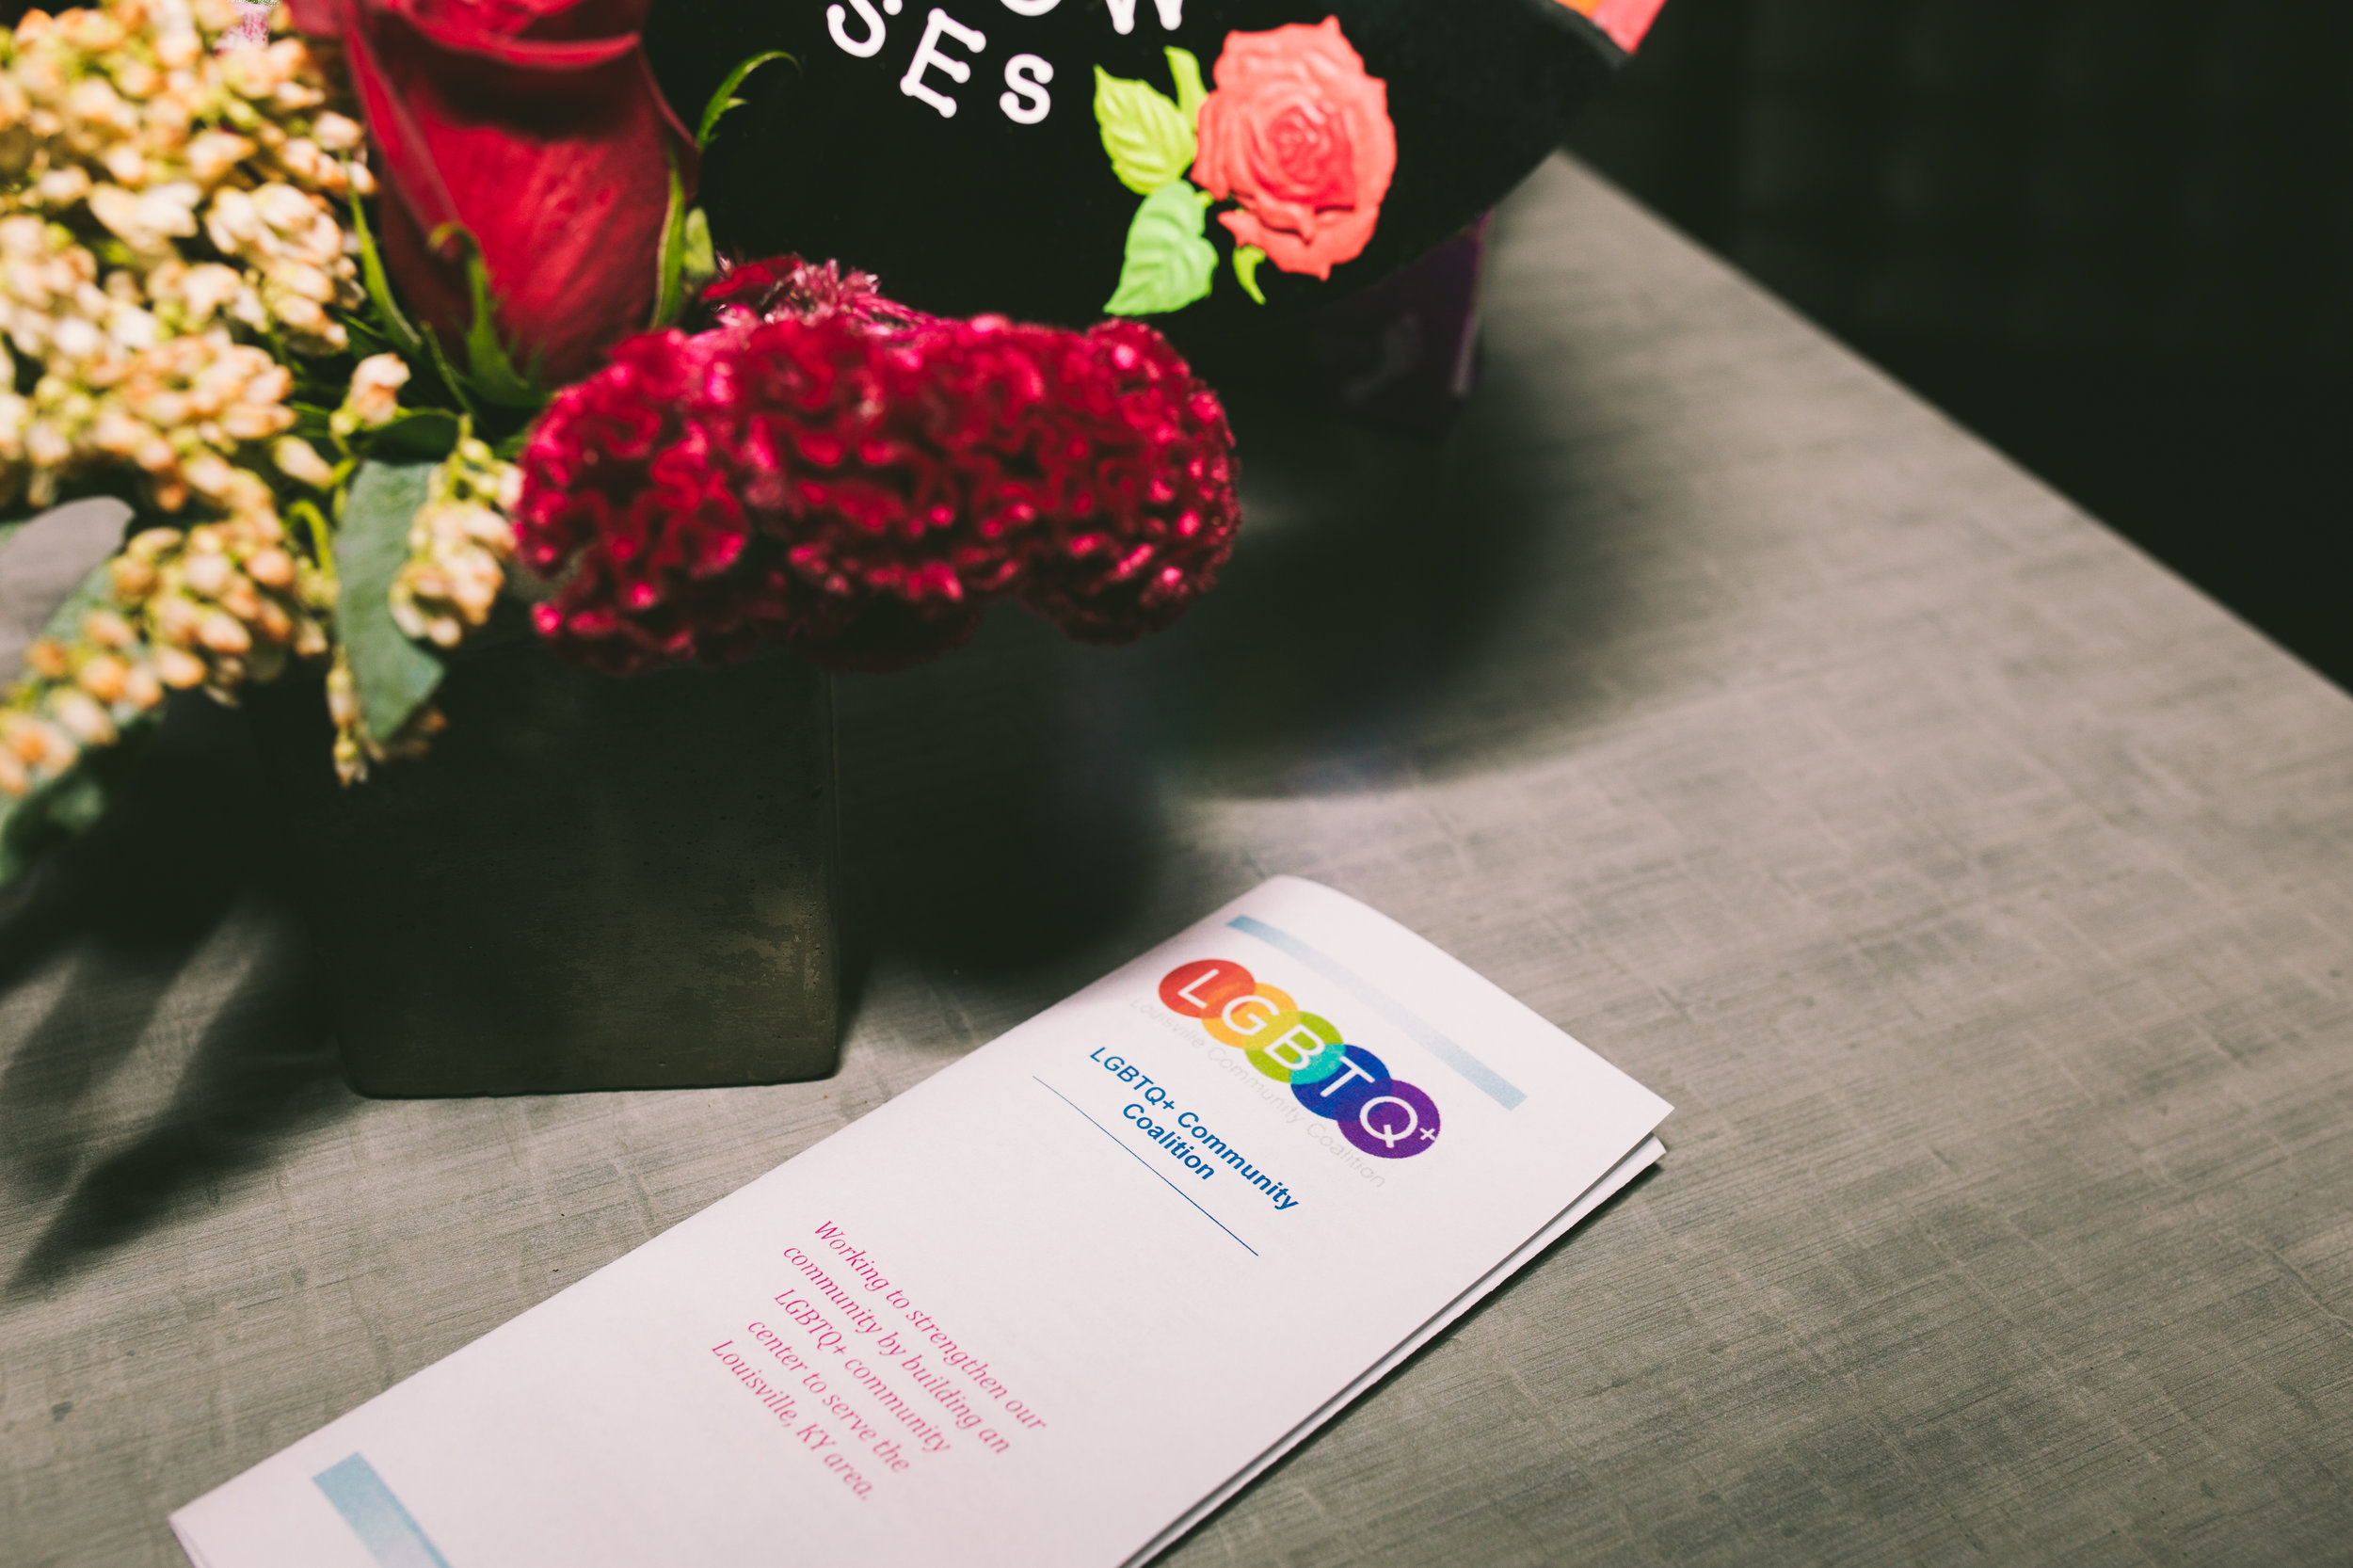 Rainbows & Roses Thurby 2017 WEBSITE FEVA PLAY Crystal Ludwick Photo 5.jpg